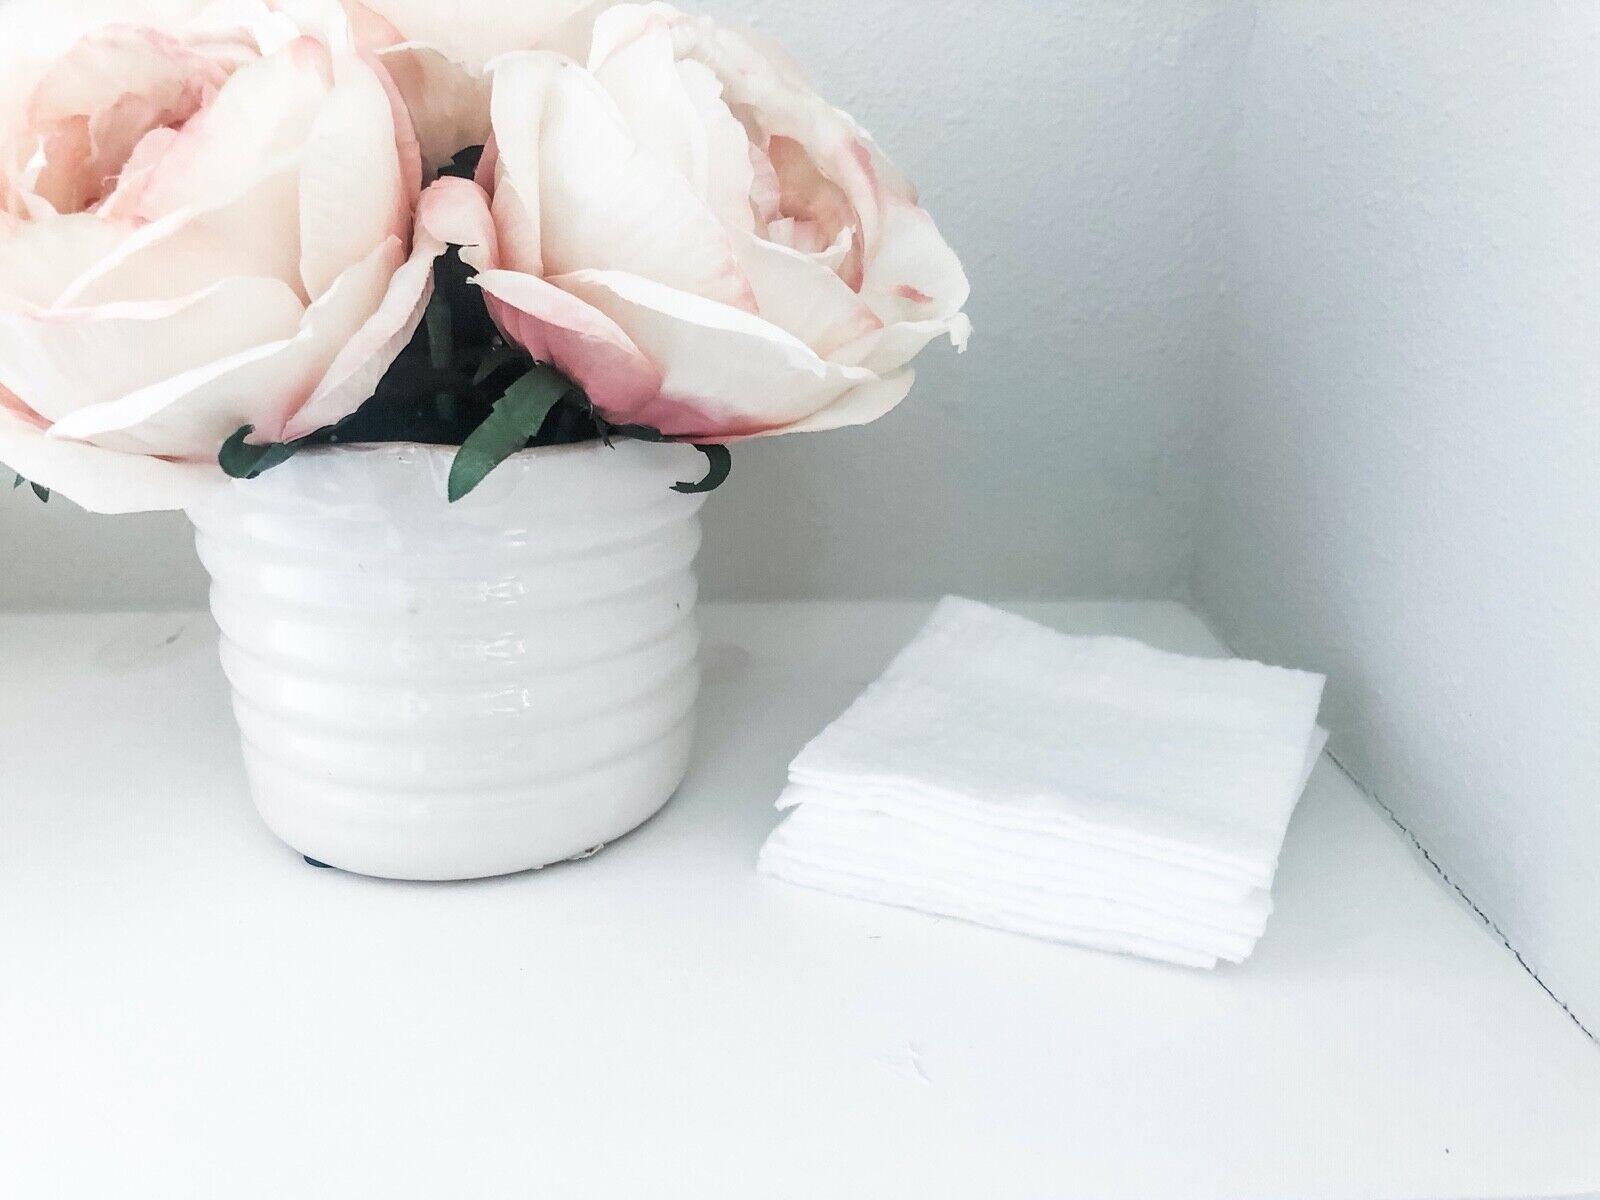 Reusable Washable Facial Body Square Large 9 Sheets - Zero W